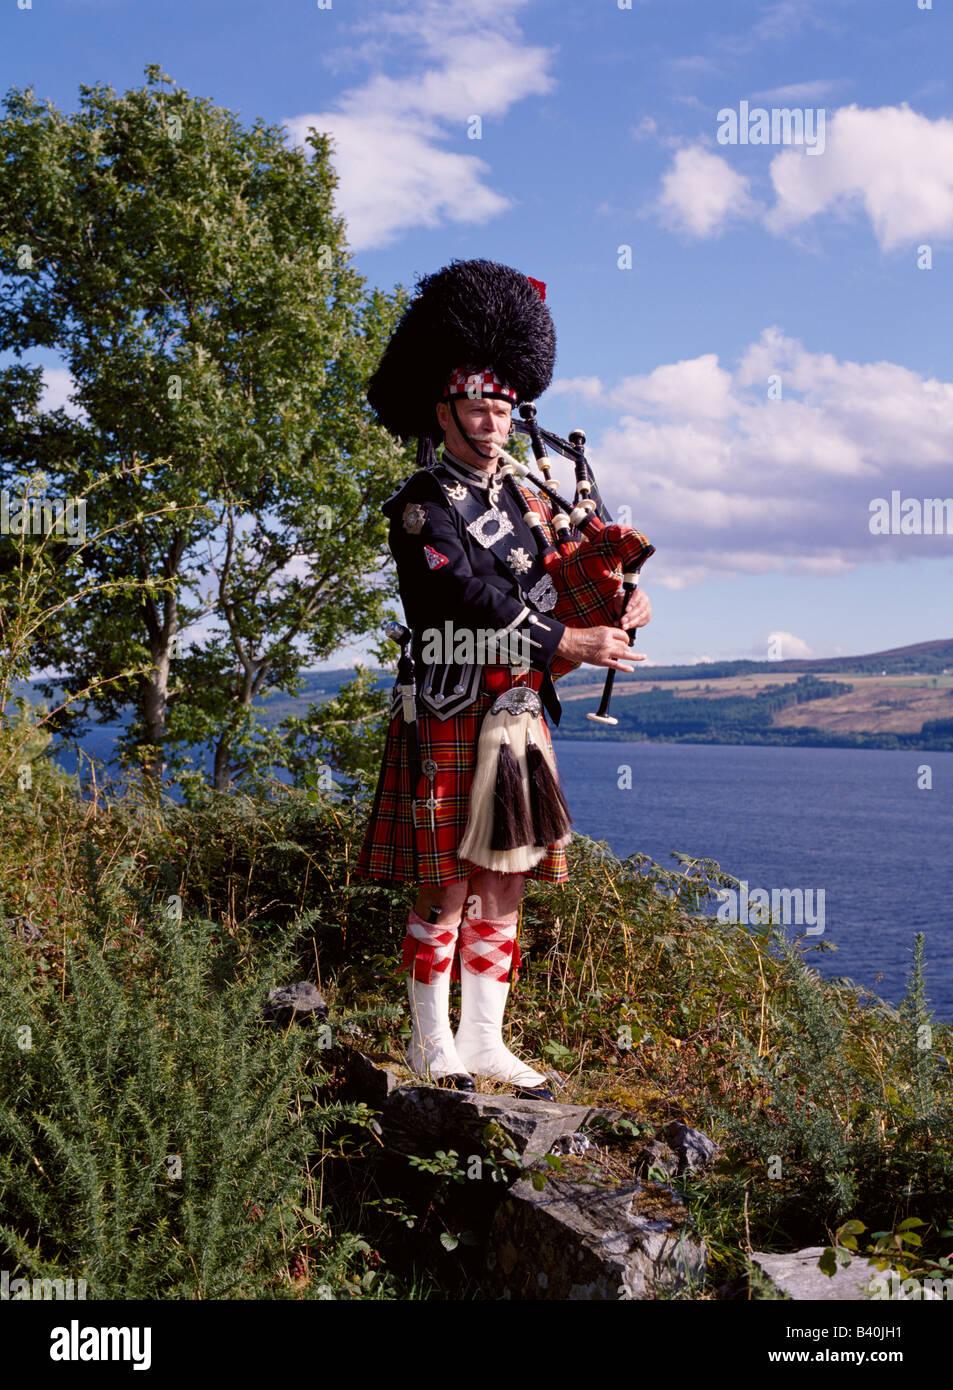 dh Scottish piper LOCH NESS INVERNESSSHIRE Bagpipes tartan kilt uniform lochside scotland bagpiper scotsman bagpipe - Stock Image